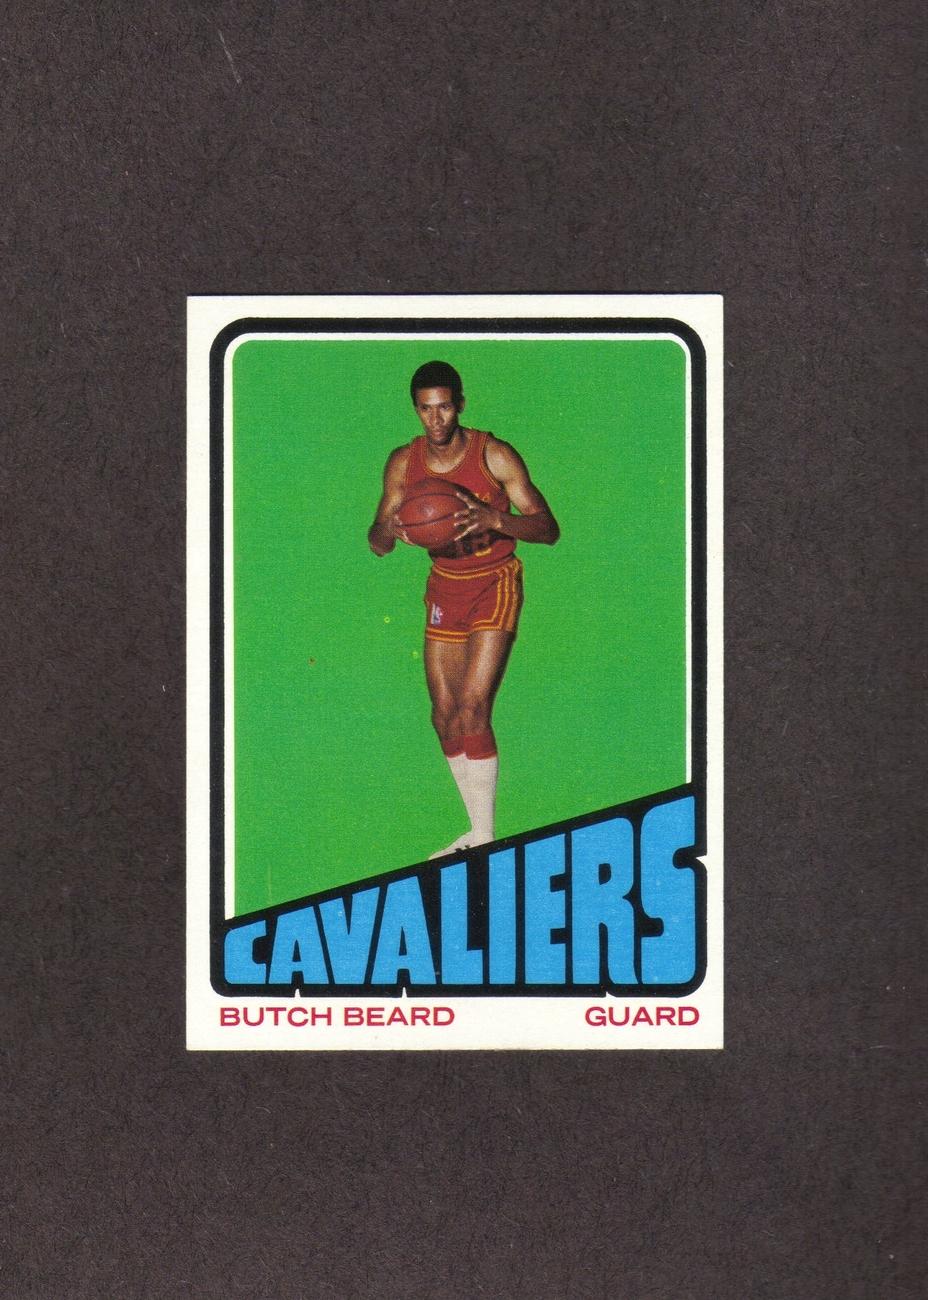 1972-73 Topps # 142 Butch Beard RC Cleveland Cavaliers NM Bonanza